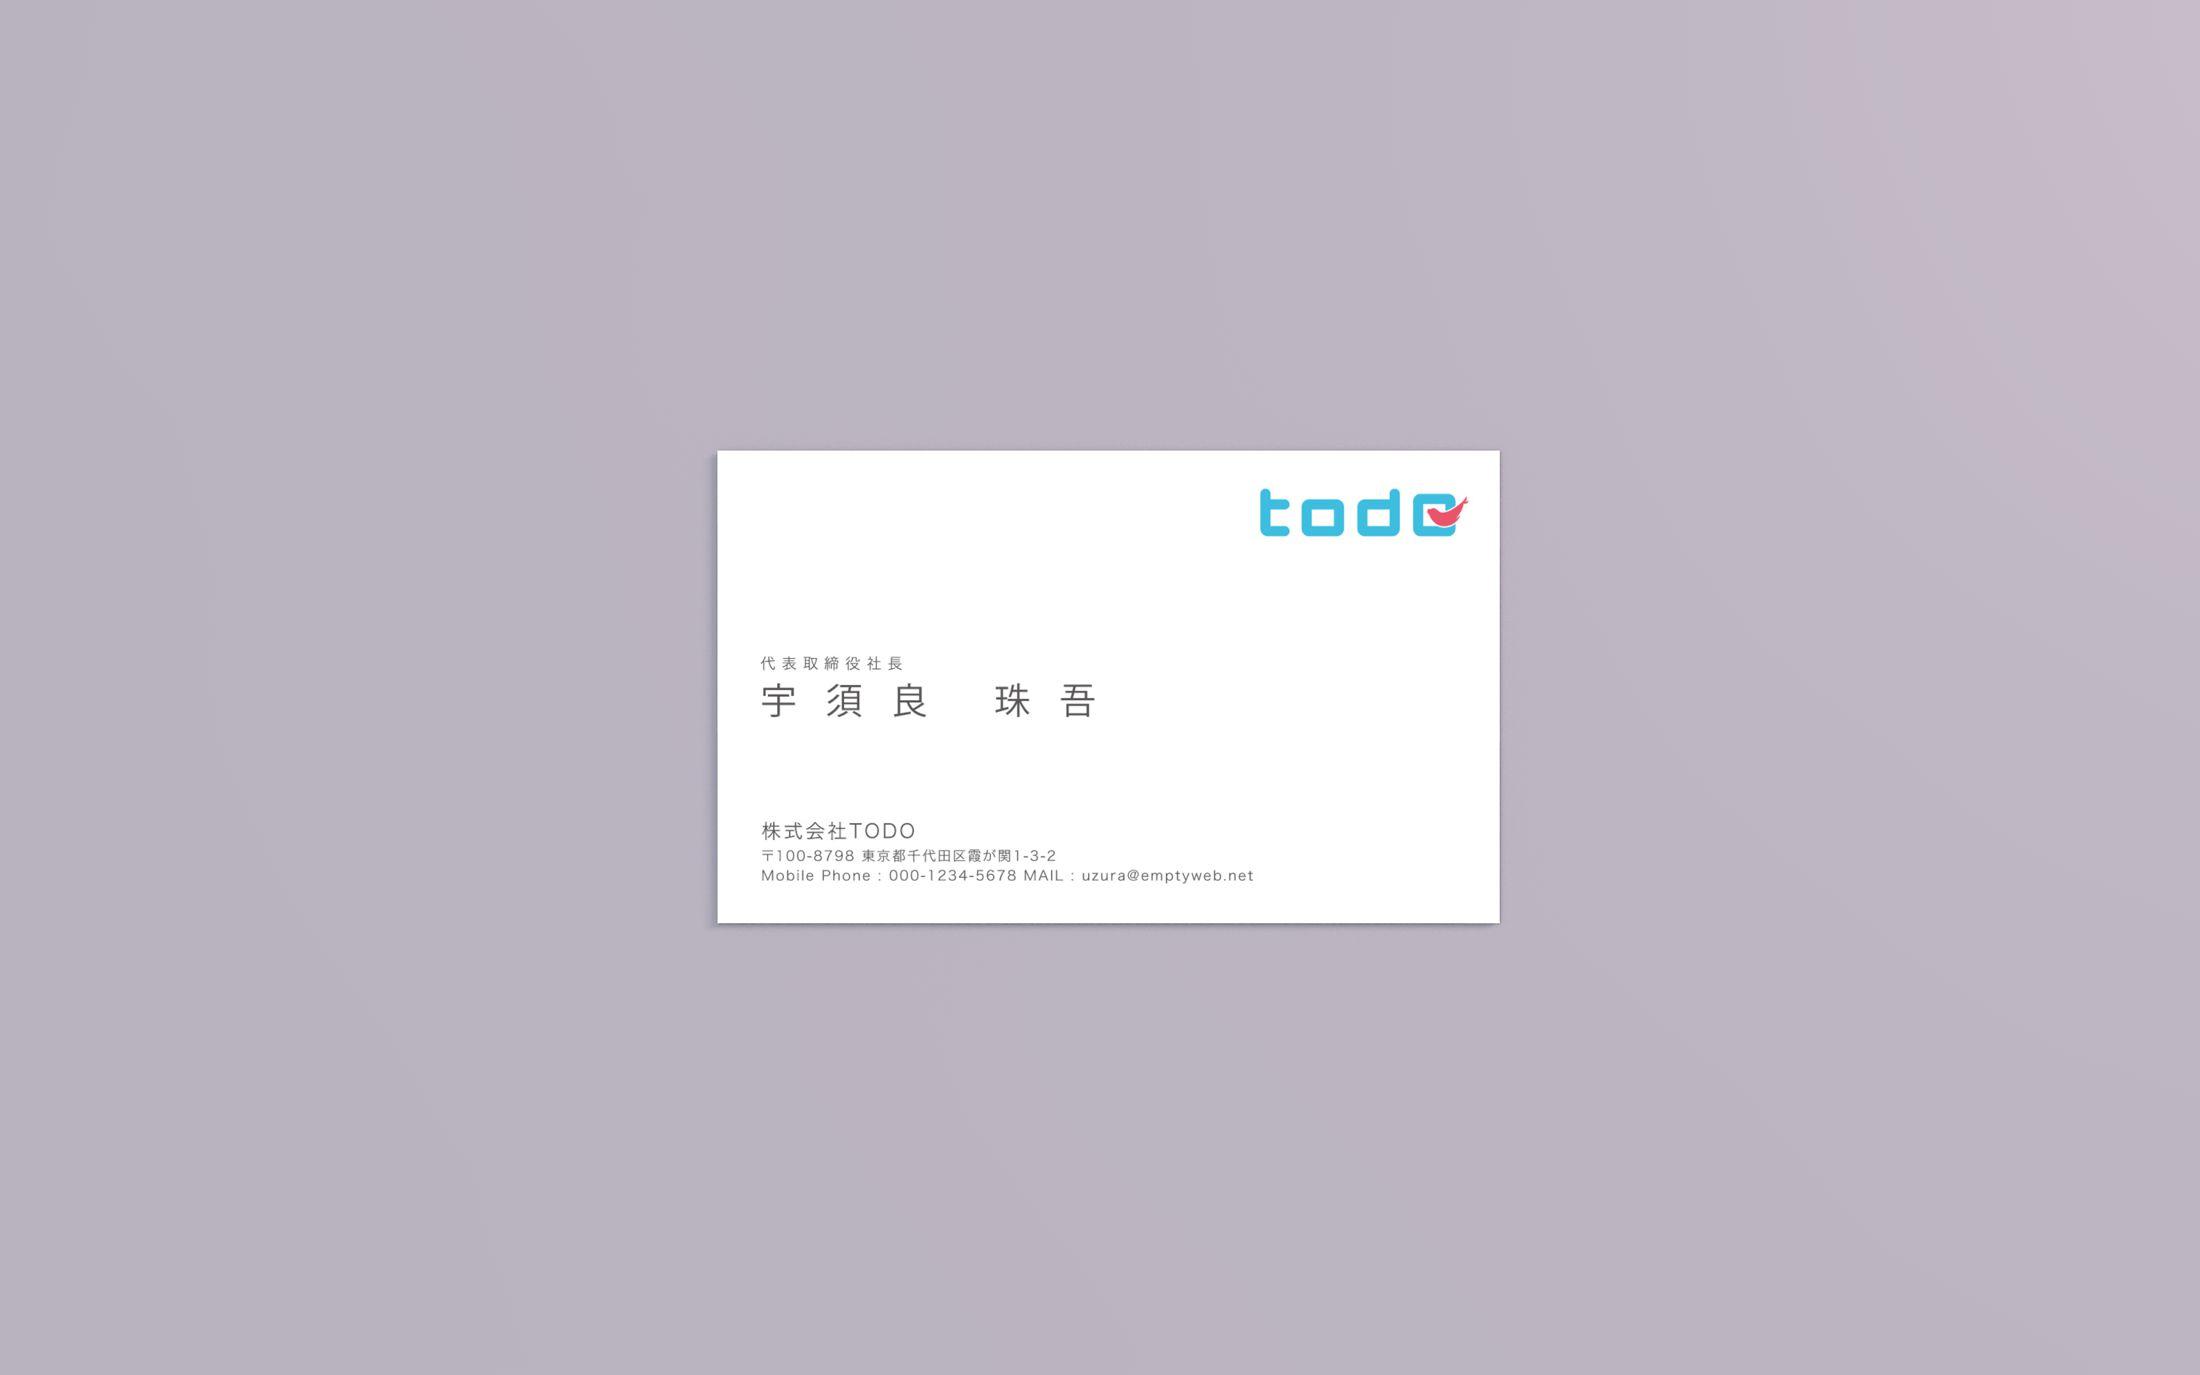 image_1207_todo_02